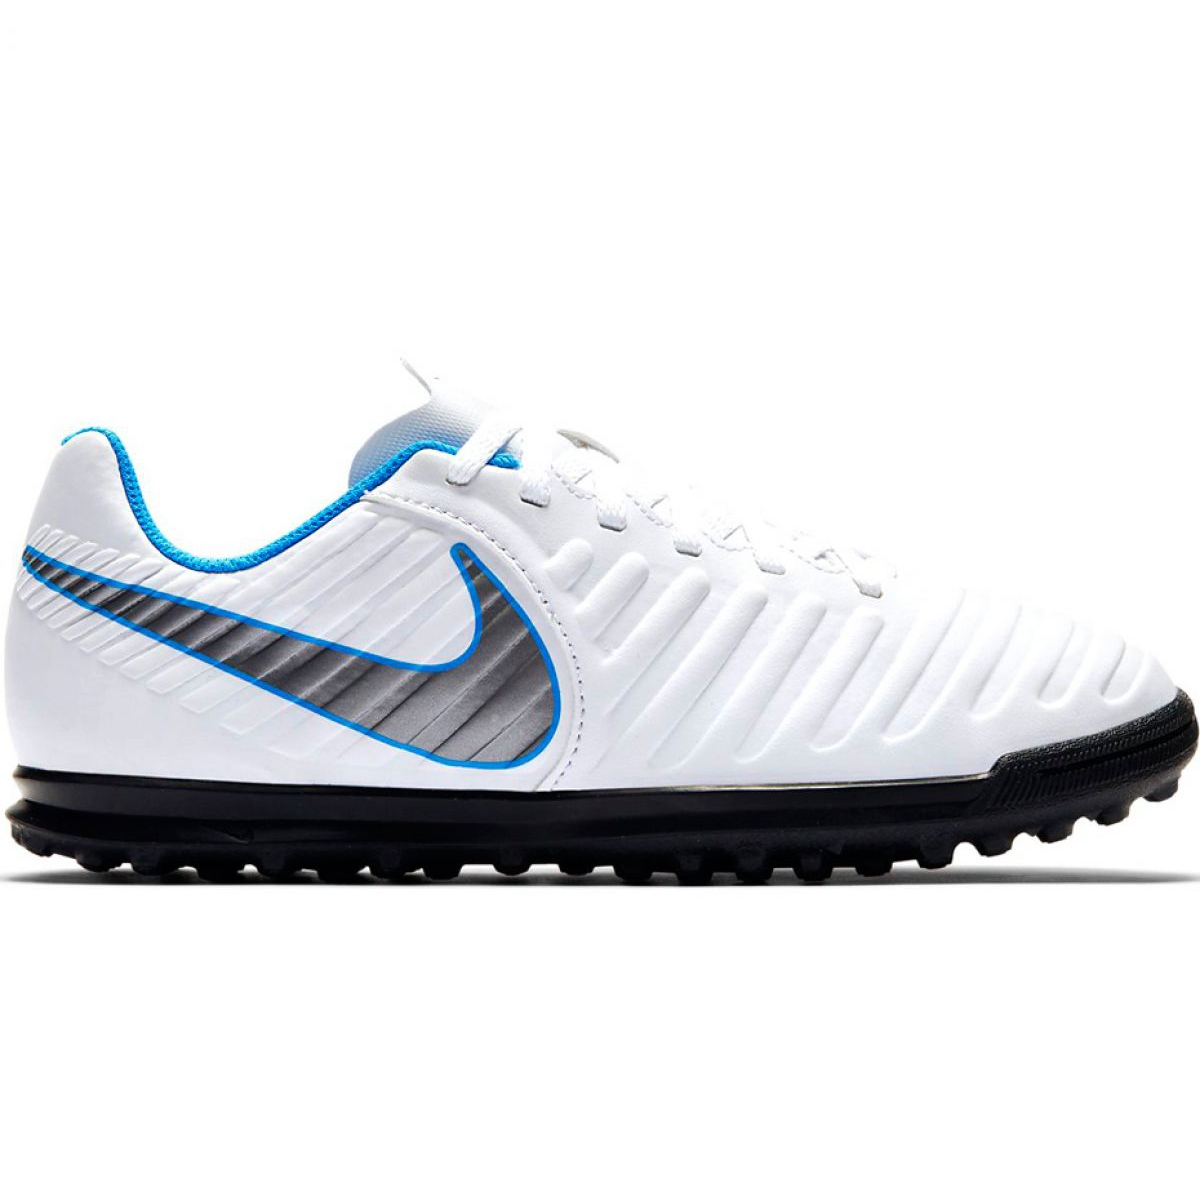 Quemar recursos humanos líquido  Nike Tiempo Legend 7 Club Tf Jr AH7261 107 football shoes white black -  ButyModne.pl